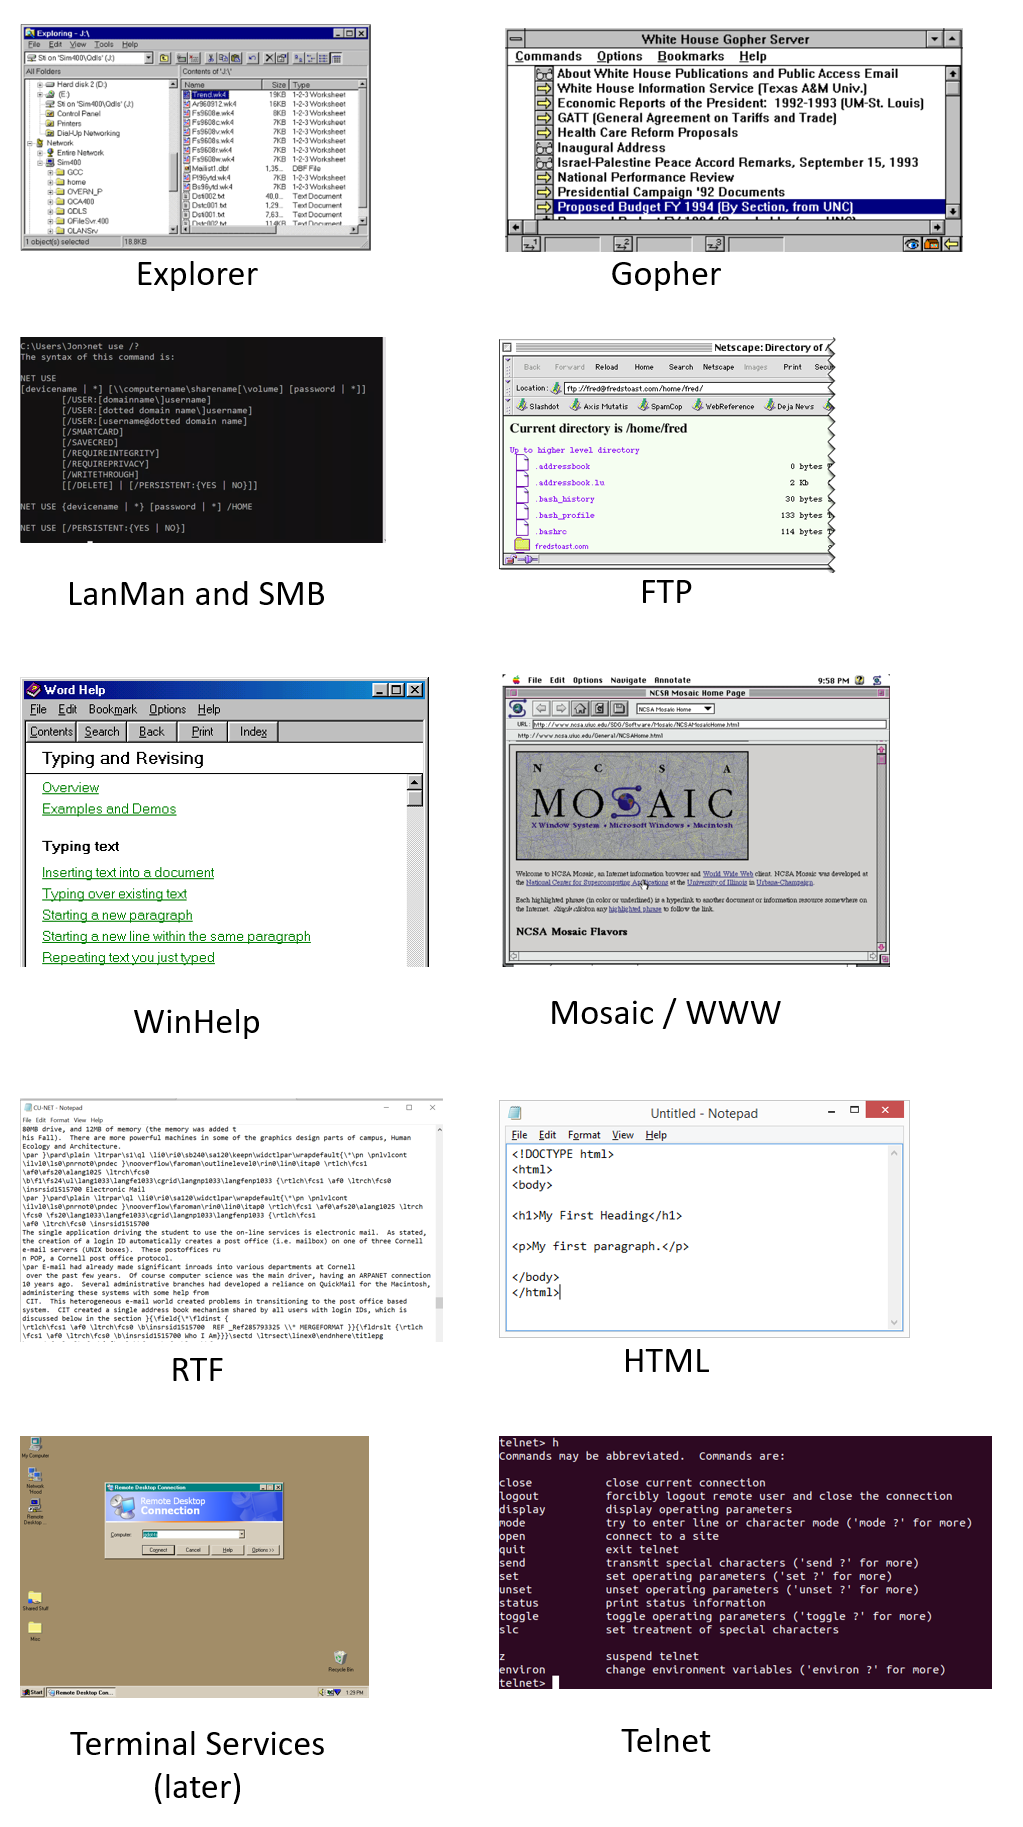 A series of images depicting microsoft technologies compared to internet technolgiies. Explorer versus Gopher, LanMan versus FTP, WinHelp versus Moasic,RTF versus HTML, Terminal services v Telnet.